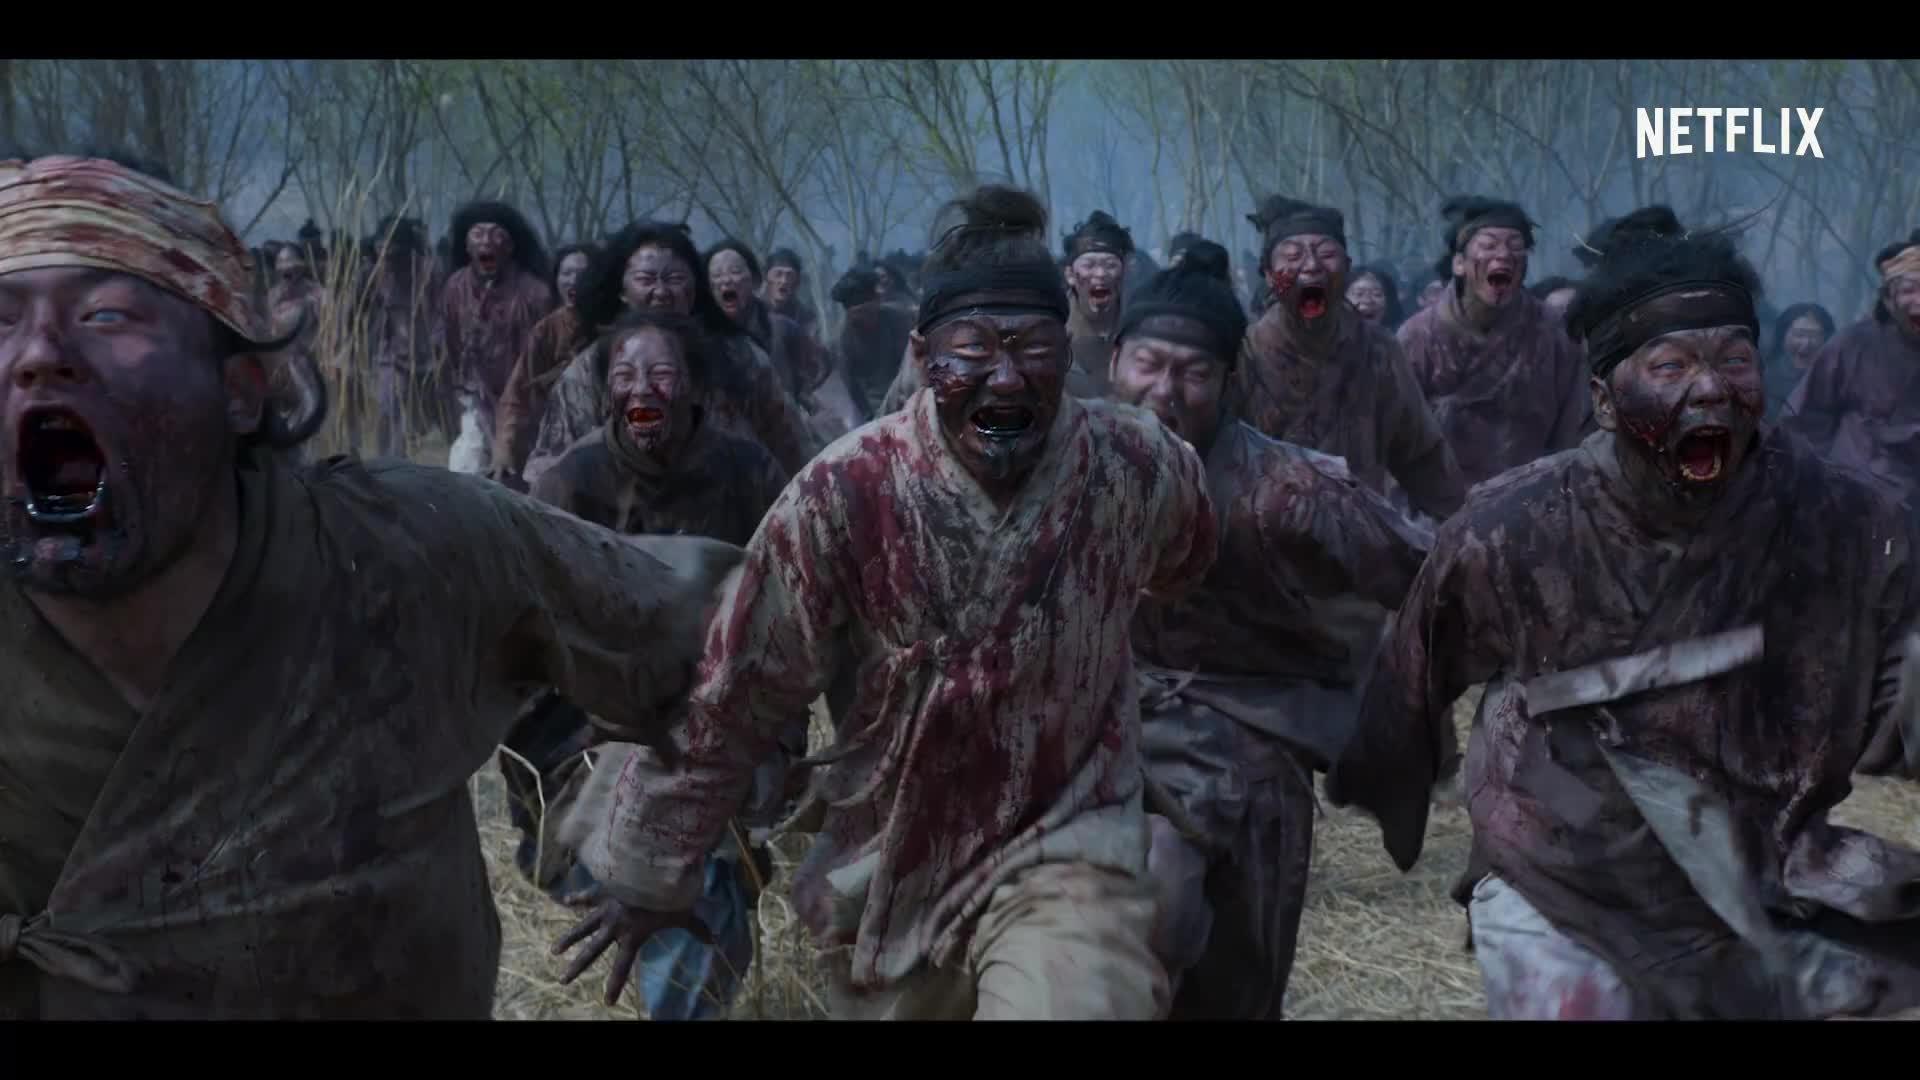 Trailer, Netflix, Serie, Zombies, Südkorea, Korea, Kingdom